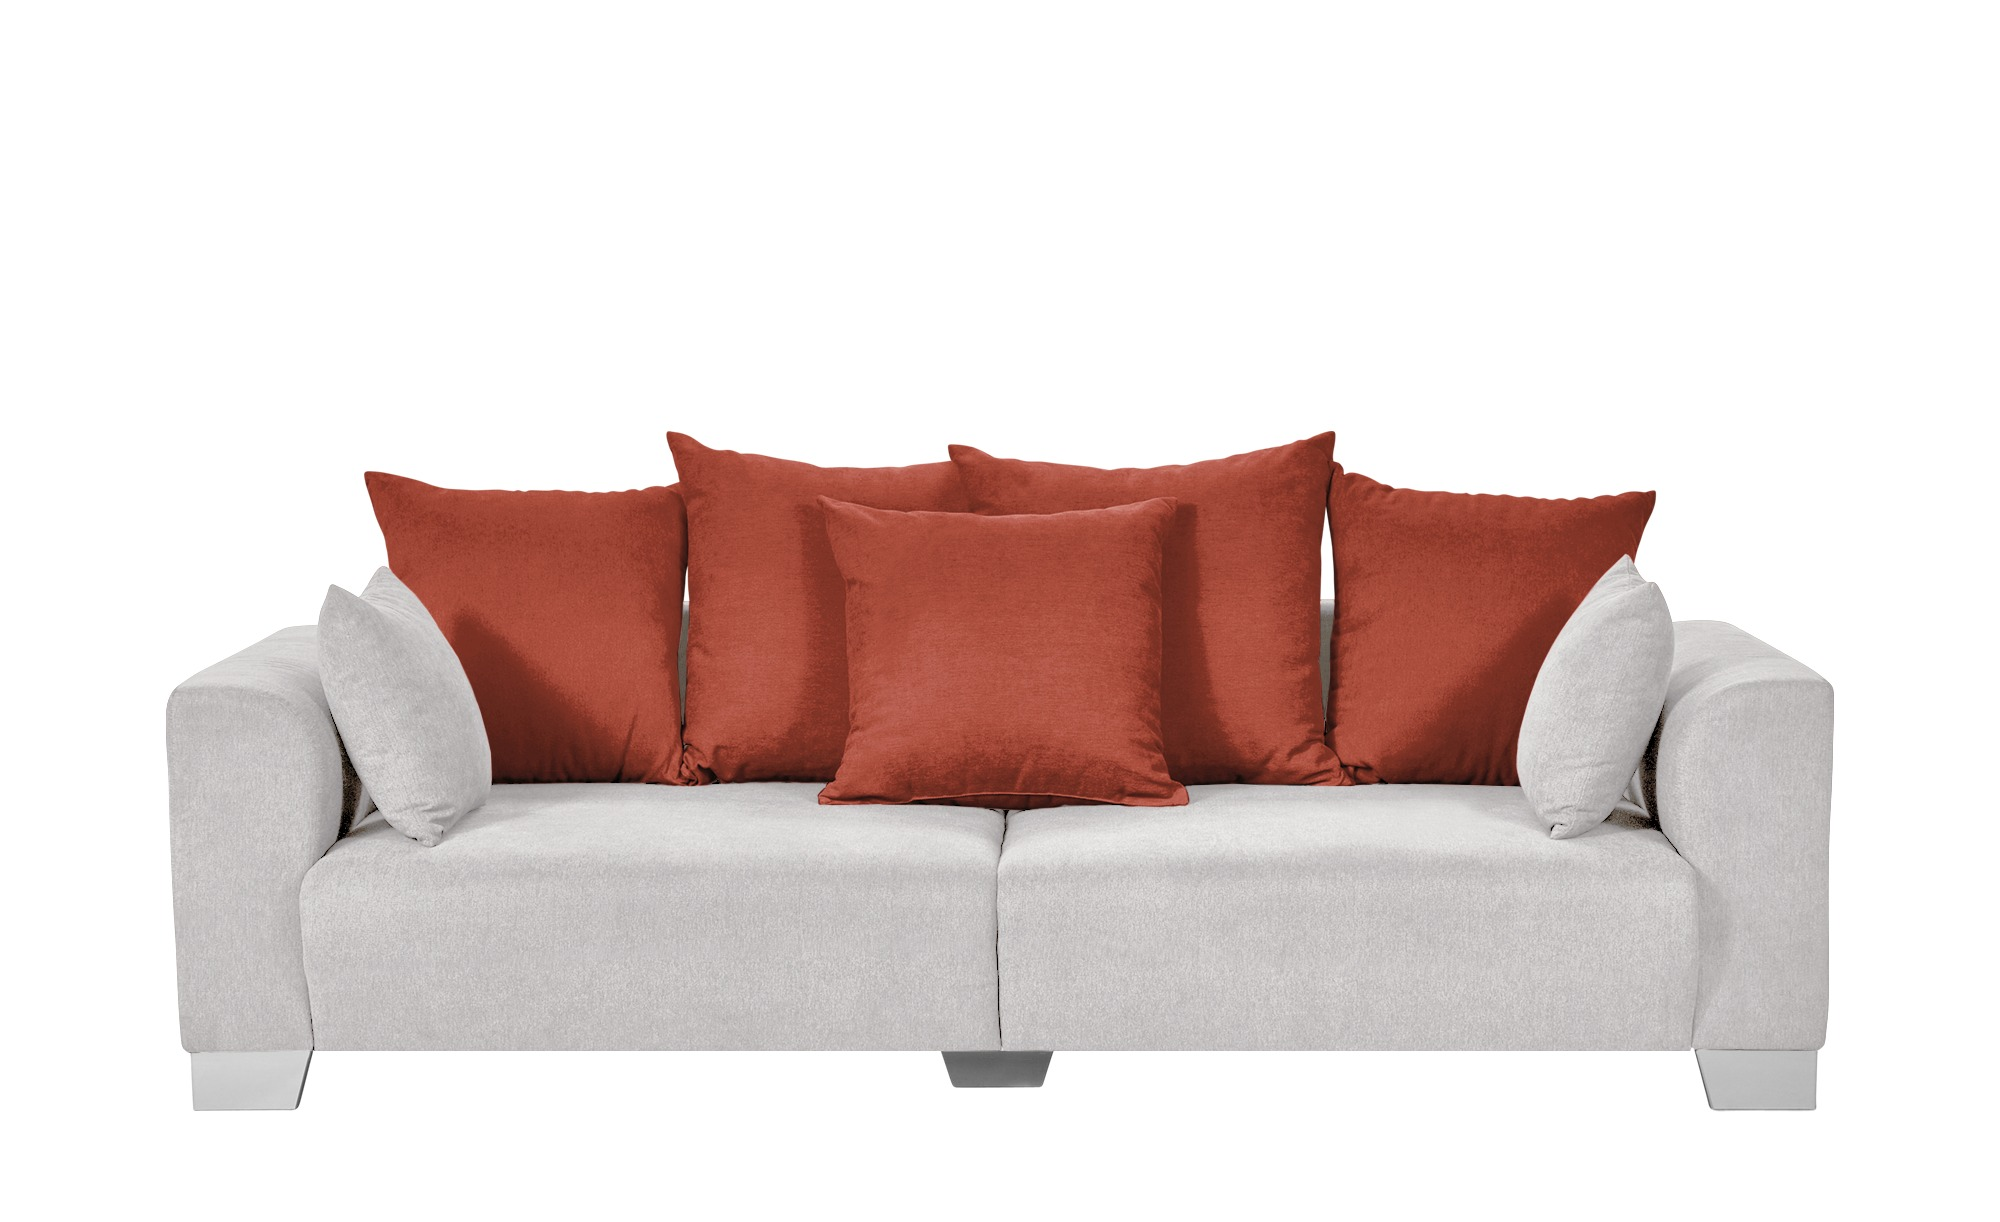 smart Big Sofa weiß - Flachgewebe Tonja ¦ weiß ¦ Maße (cm): B: 244 H: 68 T: 107 Polstermöbel > Sofas > Big-Sofas - Höffner